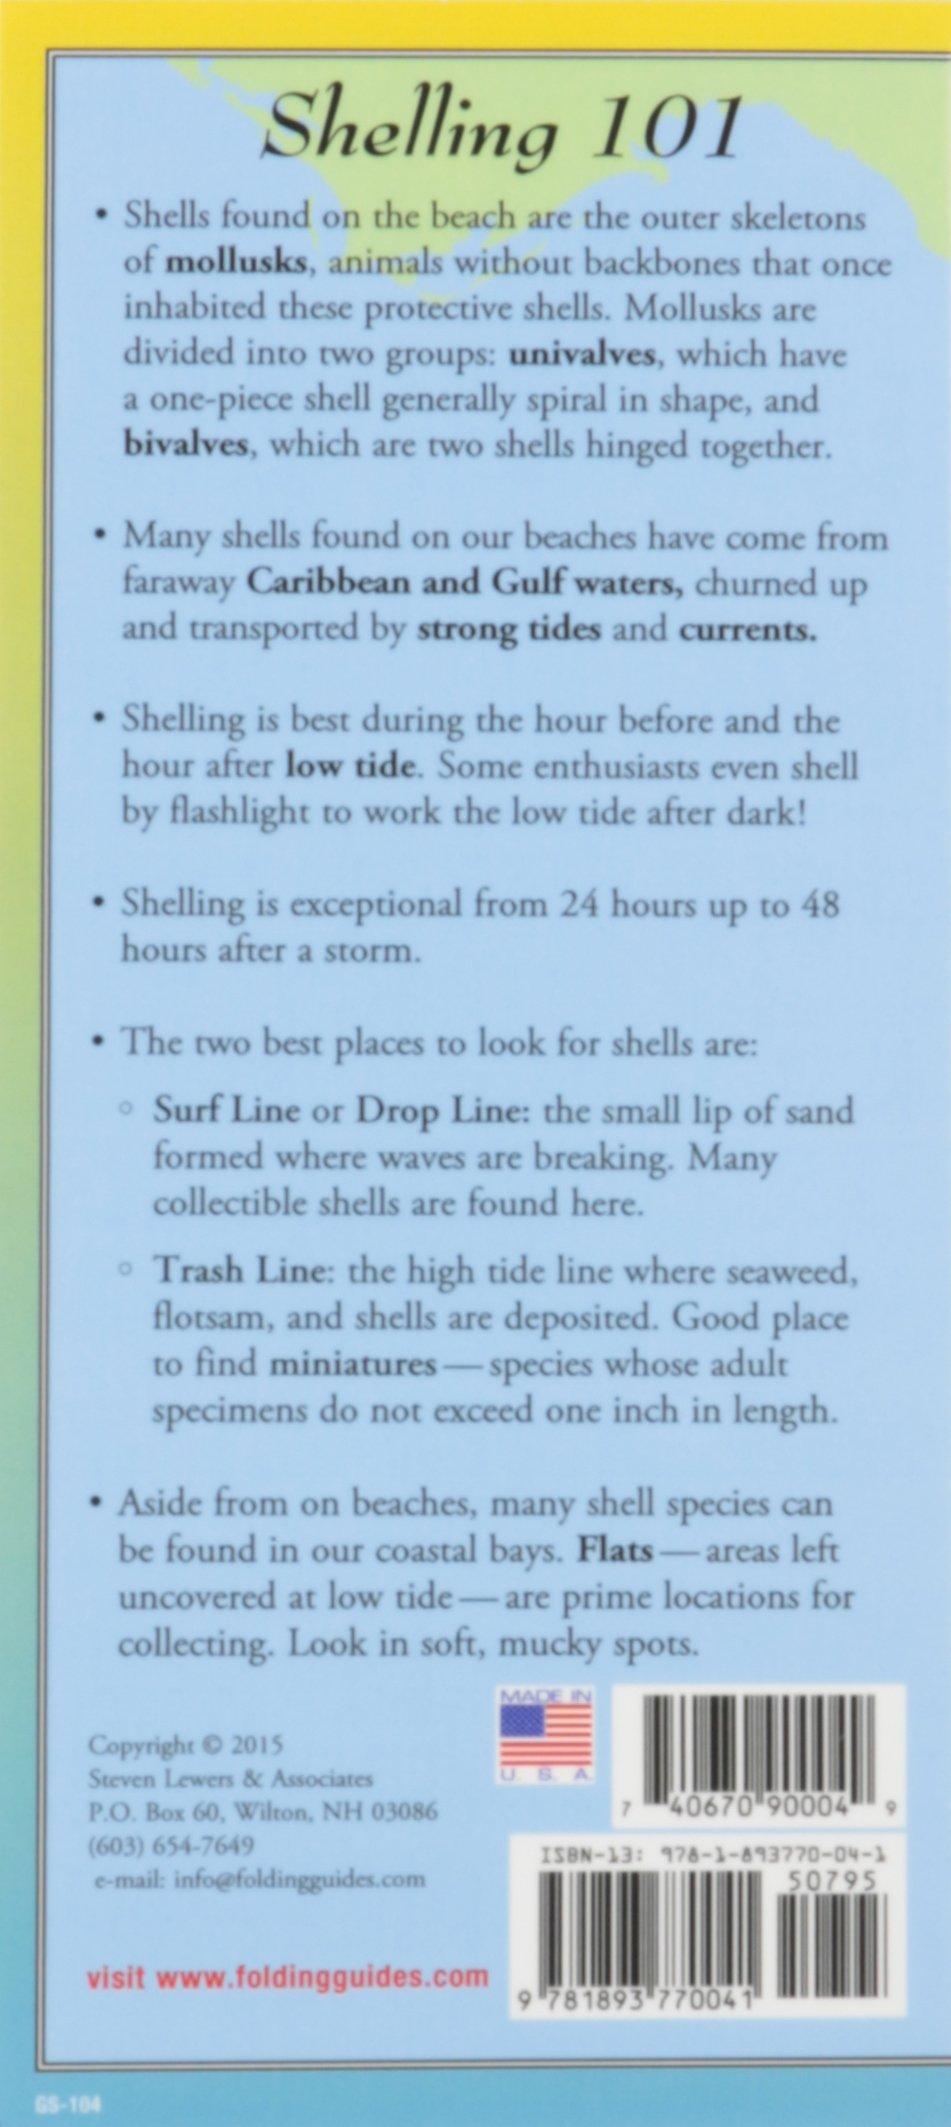 Shells of floridas gulf coast folding guide foldingguides shells of floridas gulf coast folding guide foldingguides jackie douglass 9781893770041 amazon books nvjuhfo Image collections